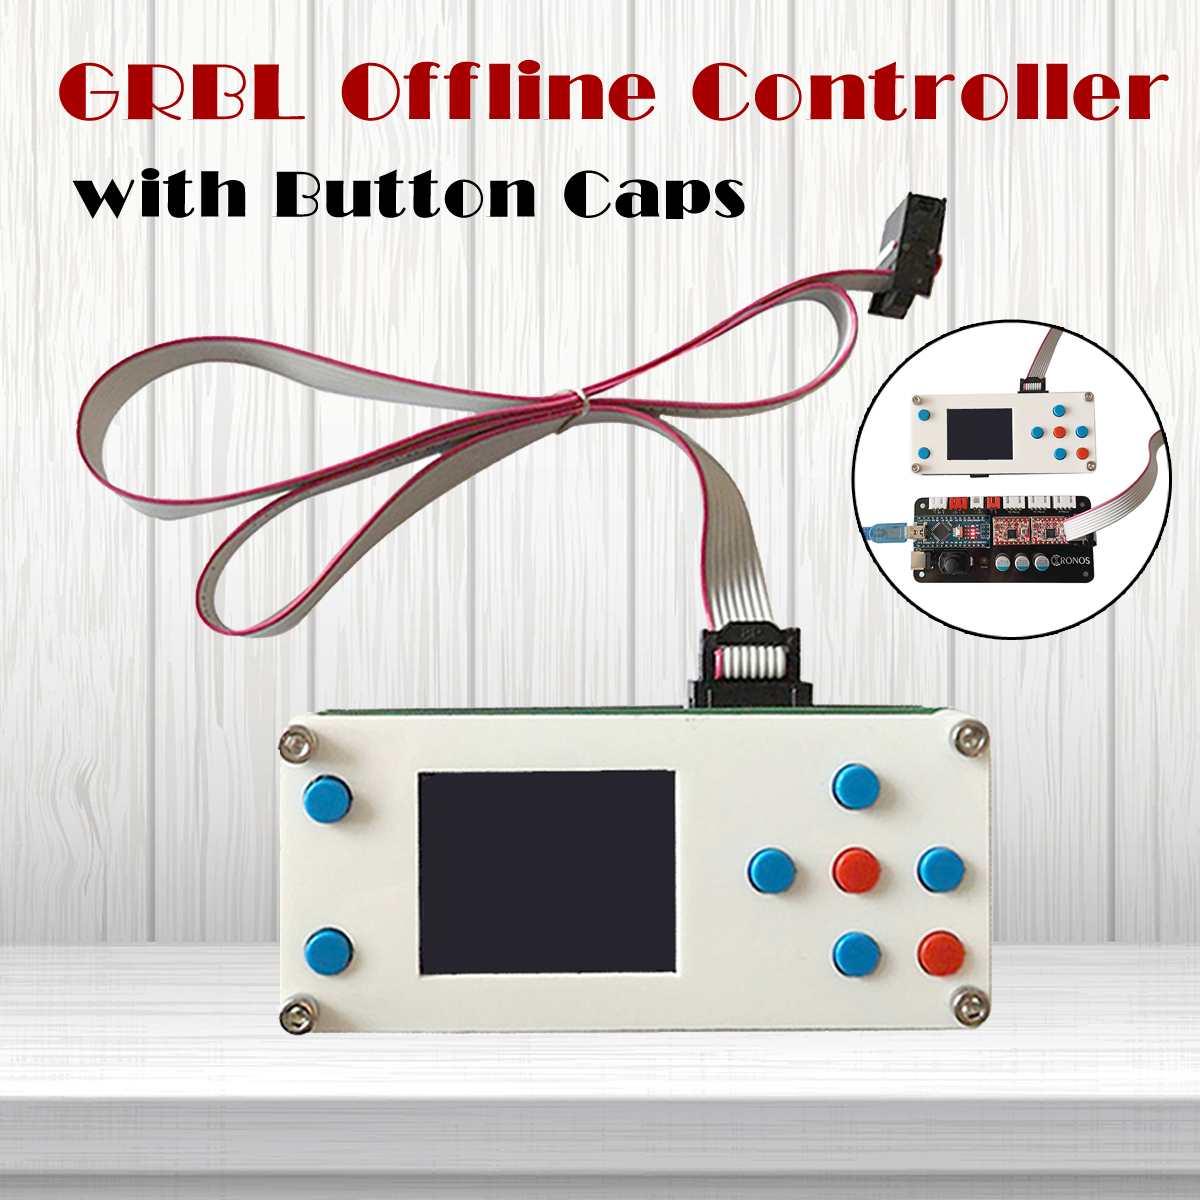 GRBL Control board CNC Controller Router CNC Engraving Machine Control Board 3 Axis Control Laser Board